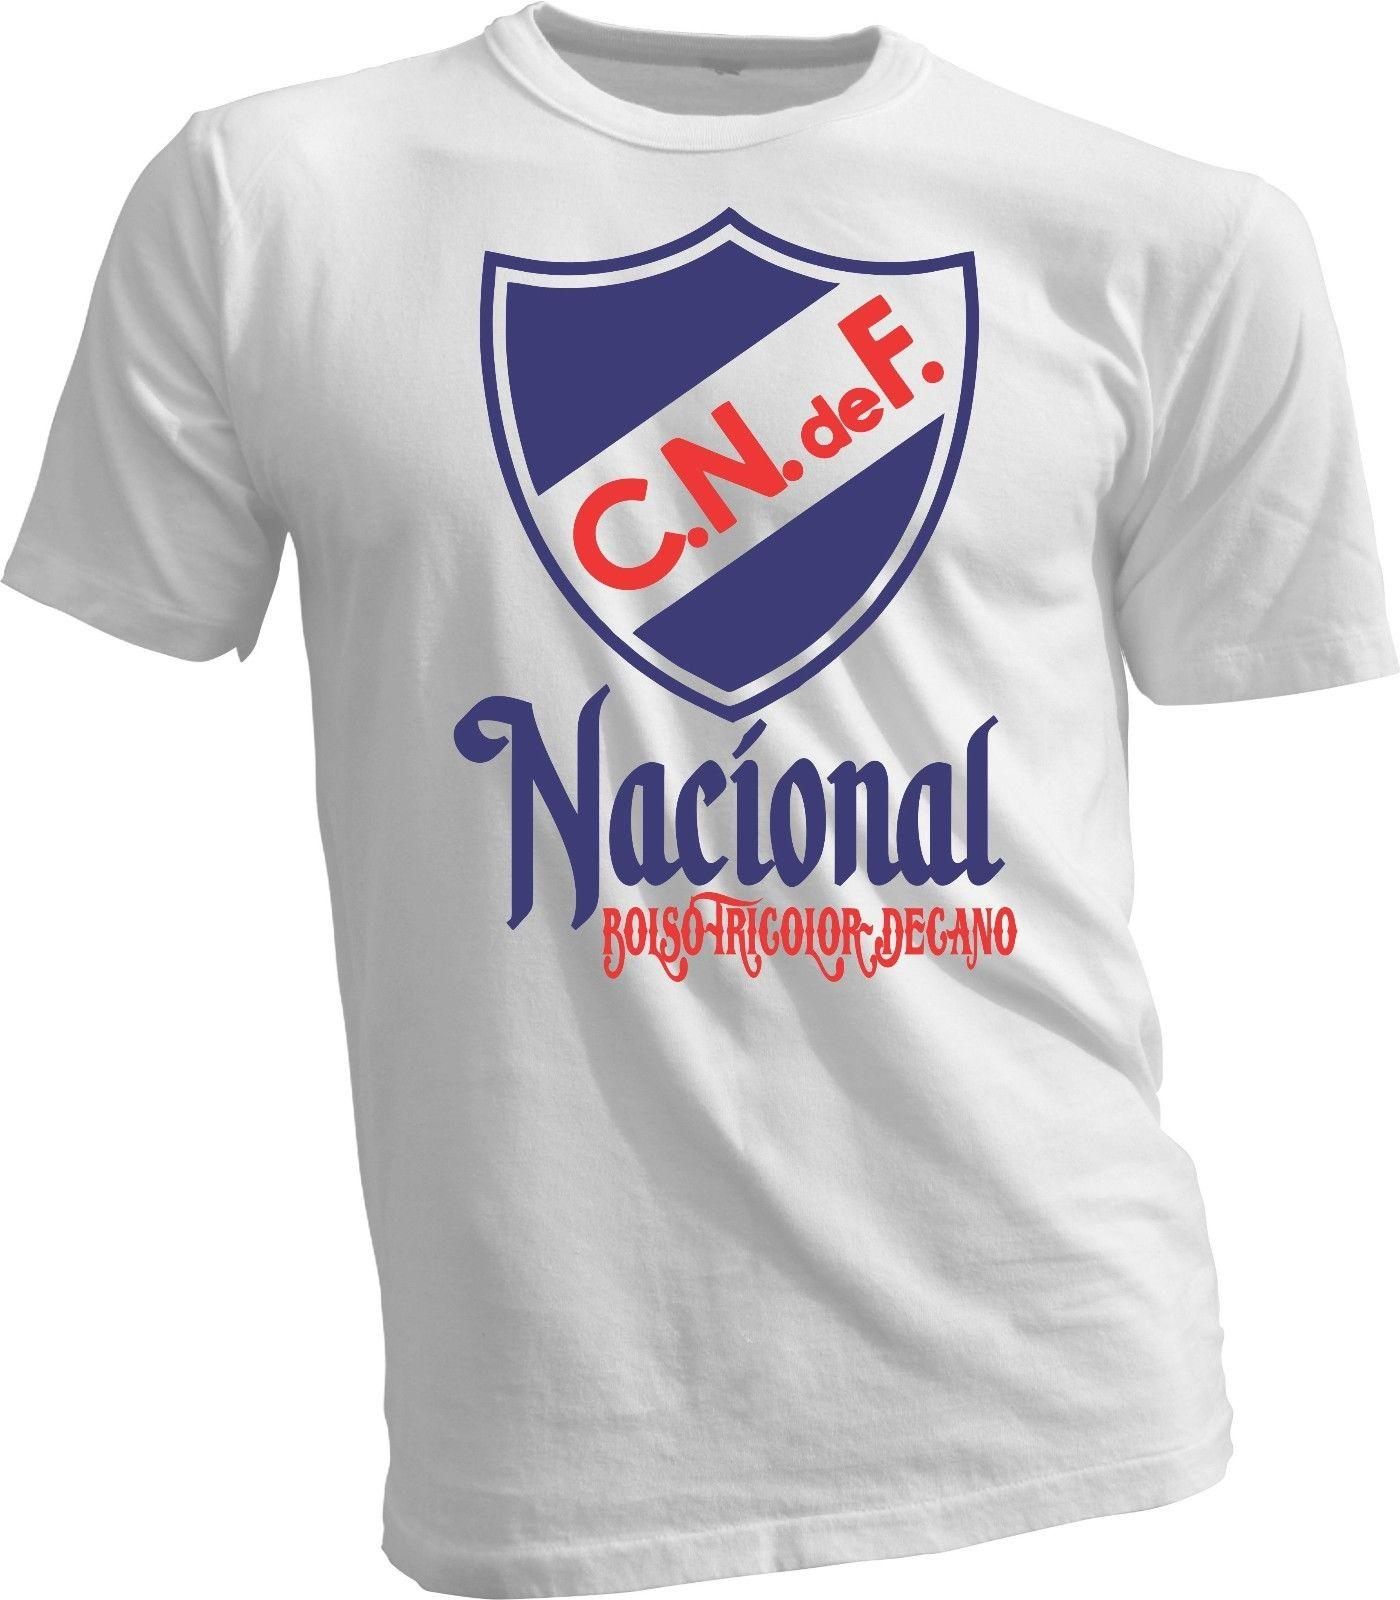 Compre Club Nacional De Uruguay Futbol Futbolista Fútbol Camiseta Camiseta  Remera Bolso A  11.01 Del Playfulltees  3f146006c9fb0